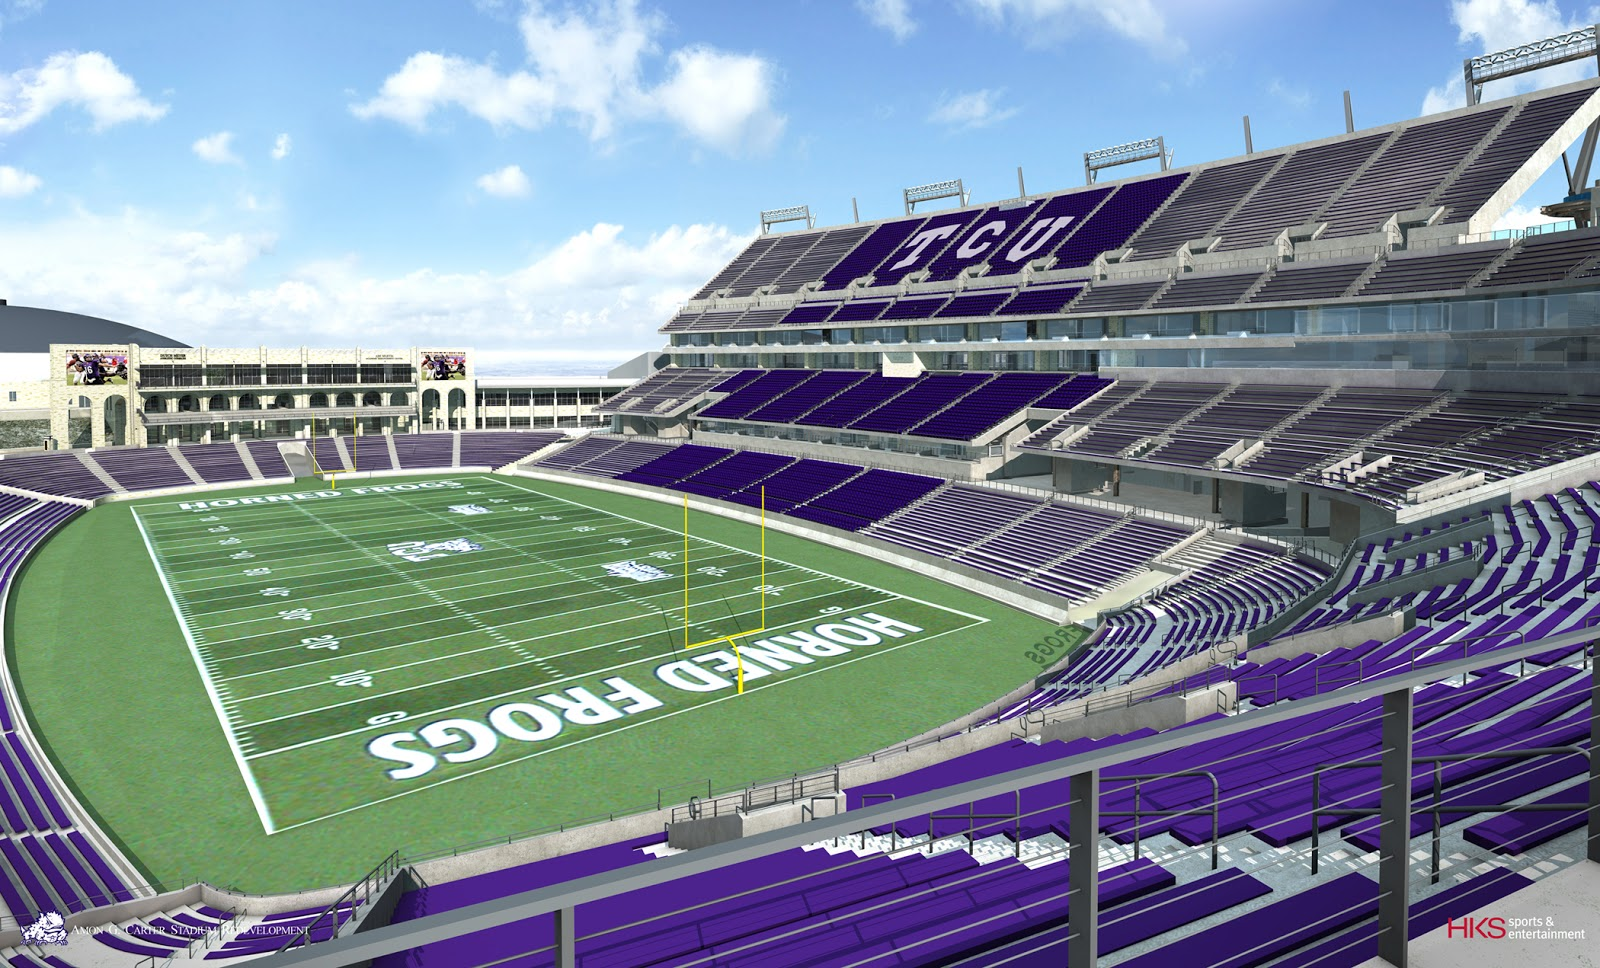 new tcu stadium seating chart: New tcu stadium seating chart amon g carter stadium seating